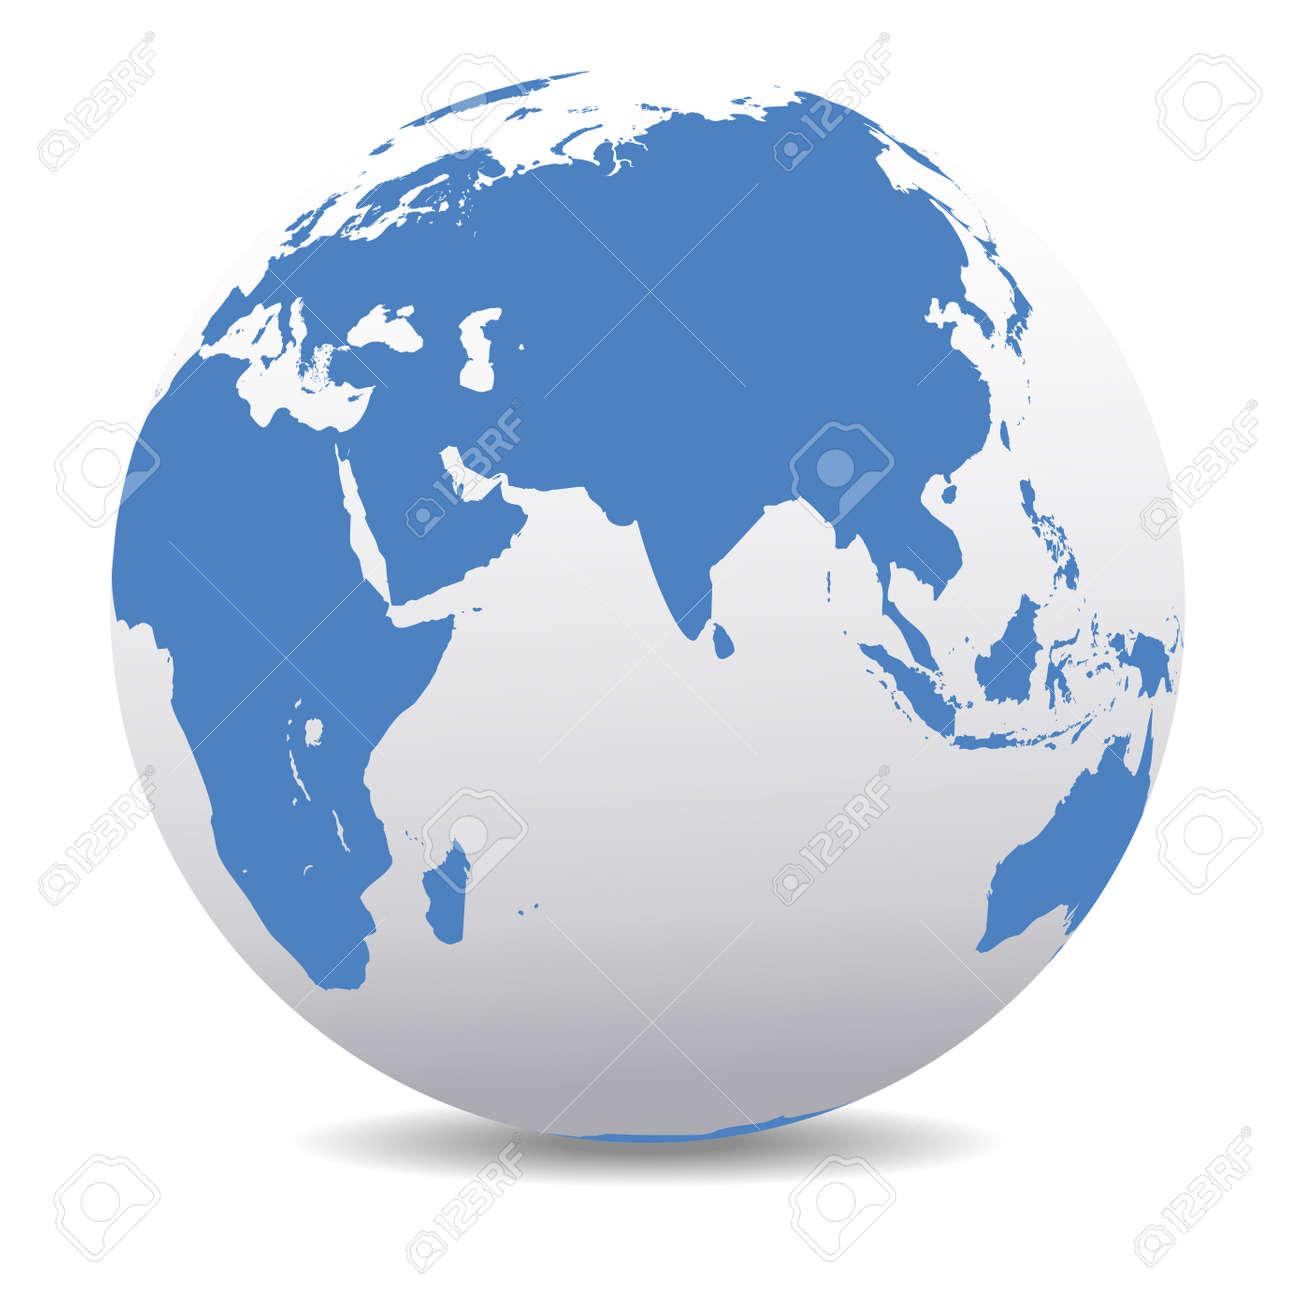 India, Africa, China, Indian Ocean, Global World - 35857208